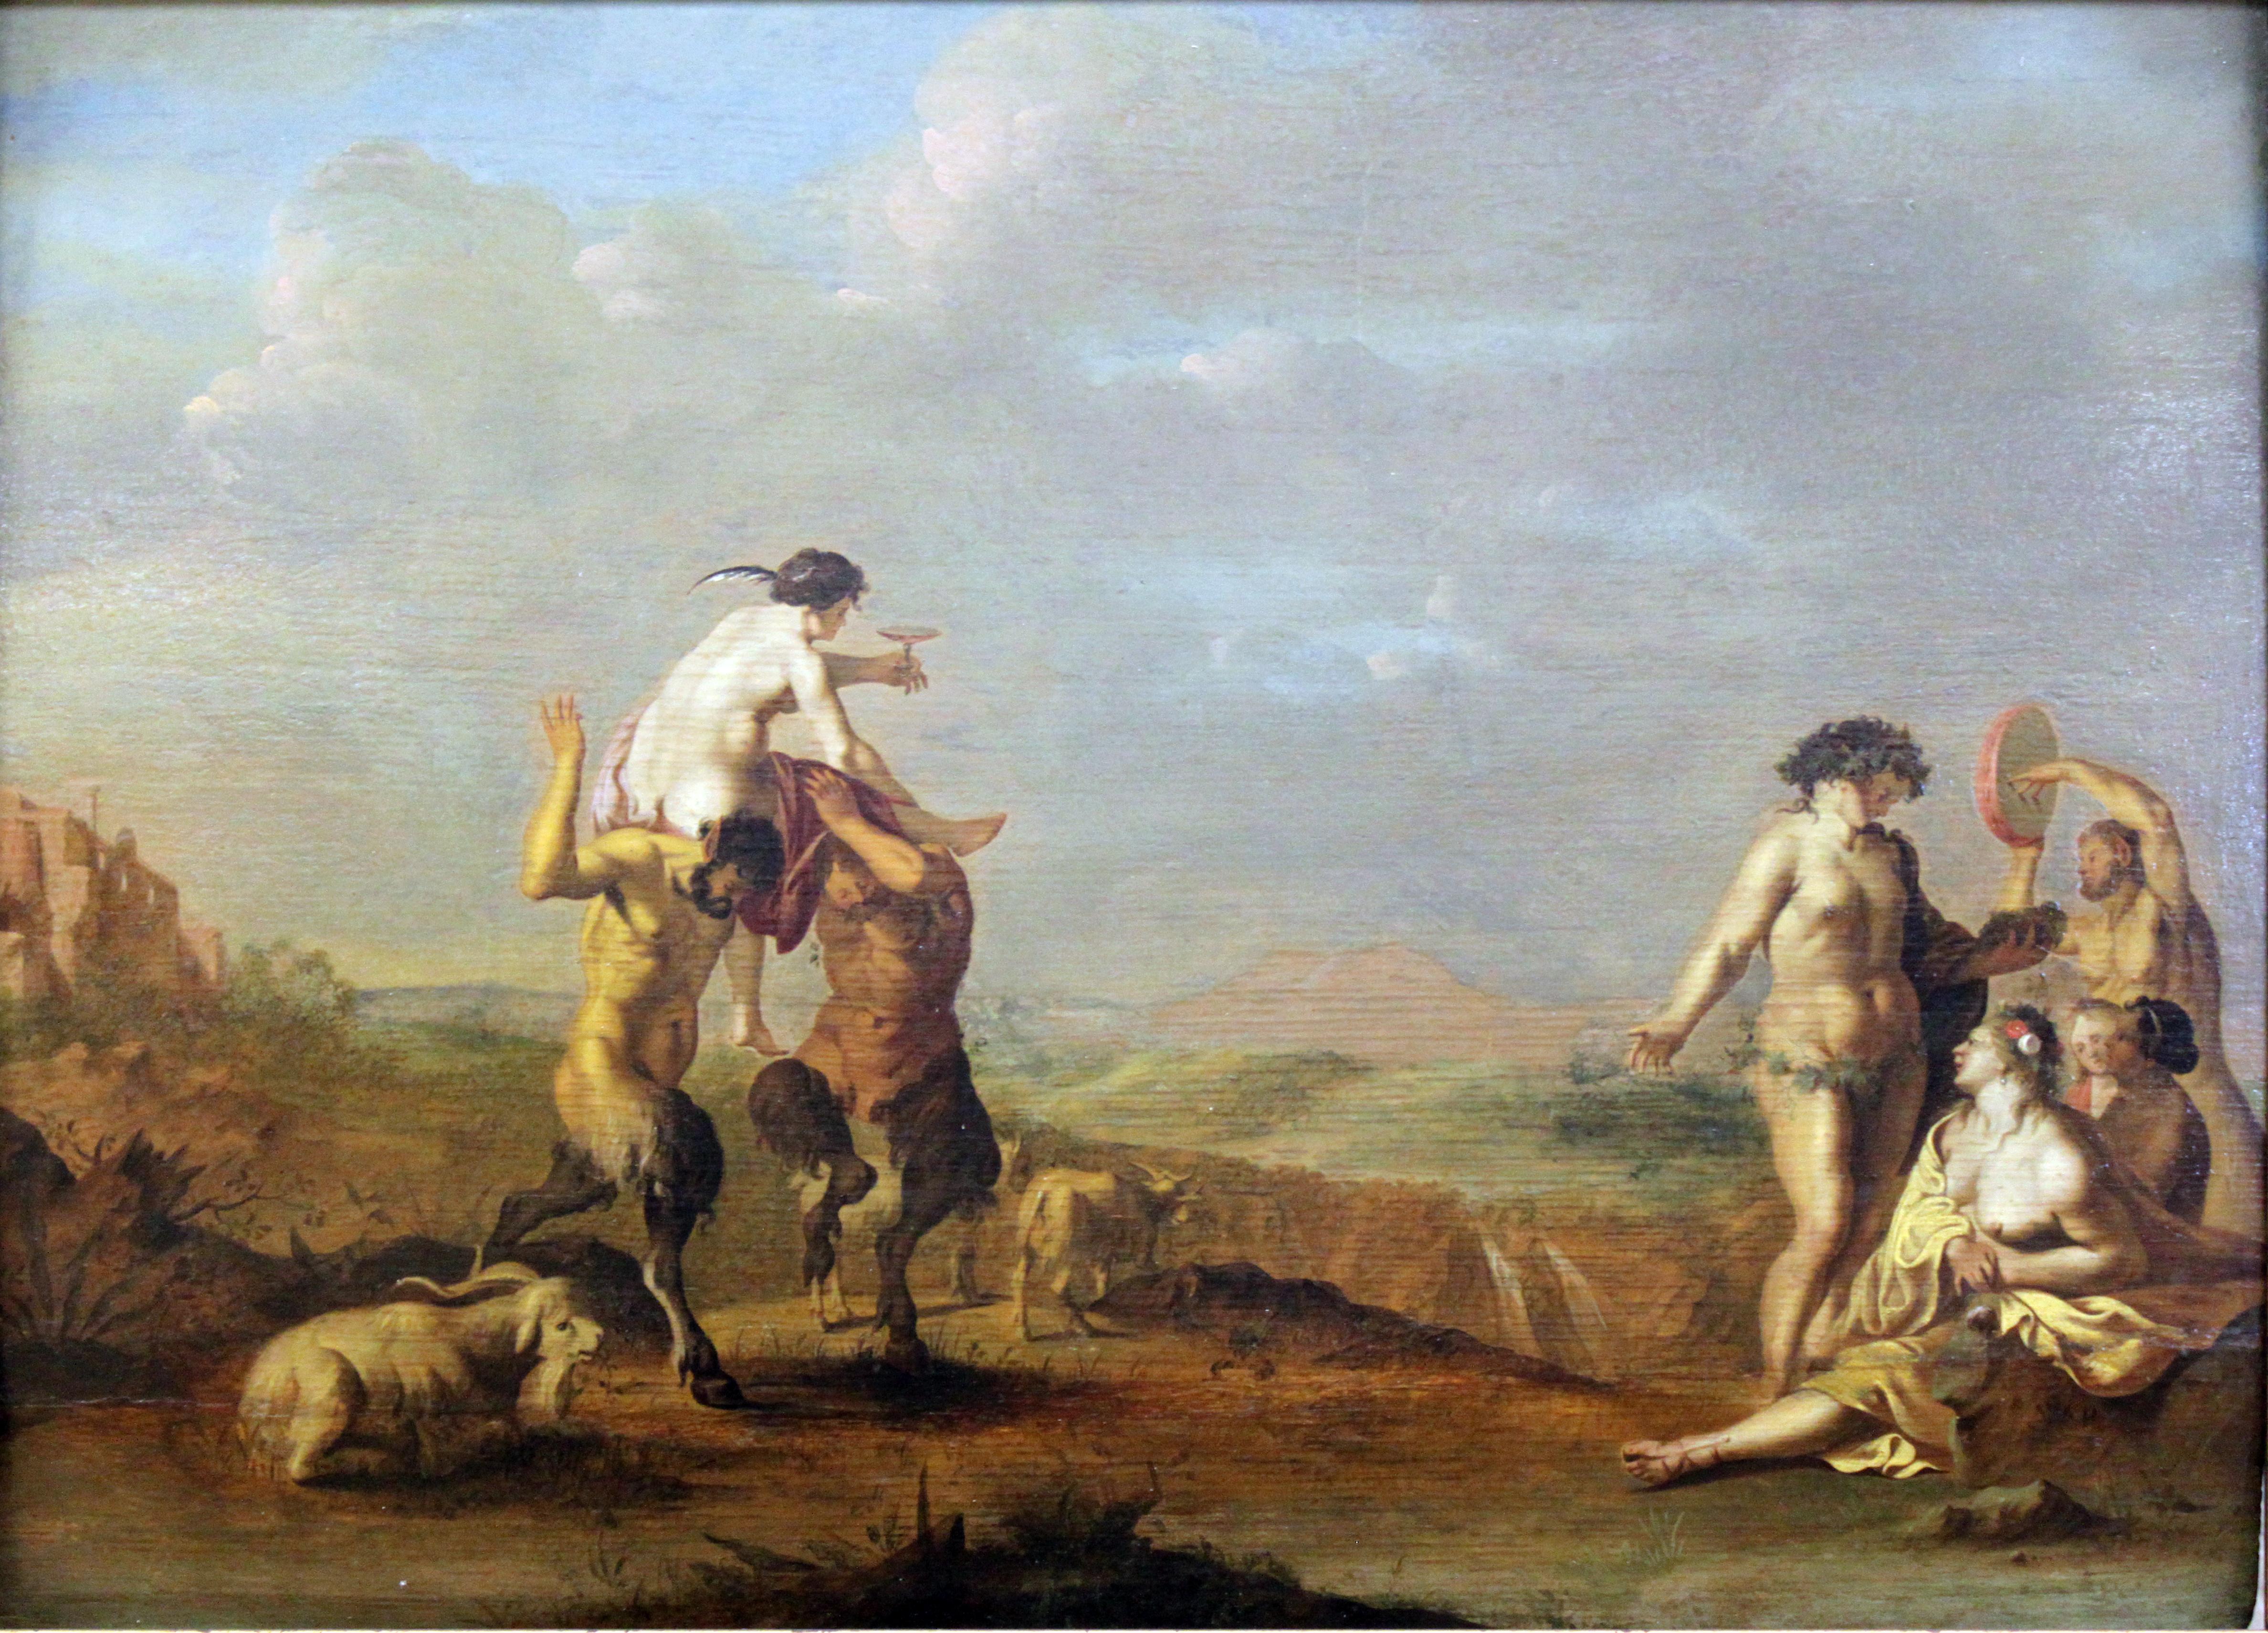 File:1651 van Poelenburch Bacchanal anagoria.JPG